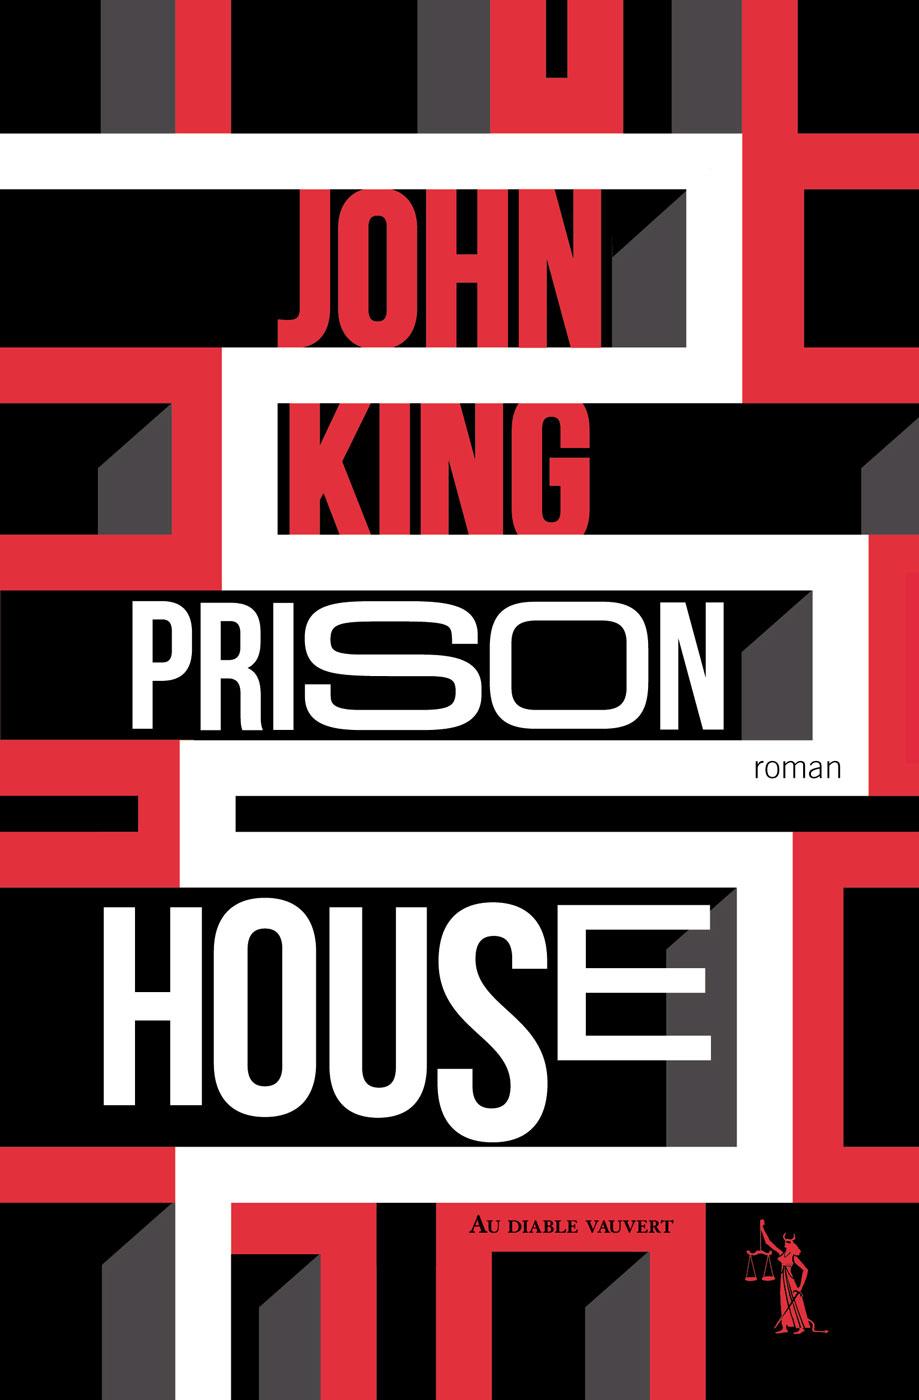 Prison House